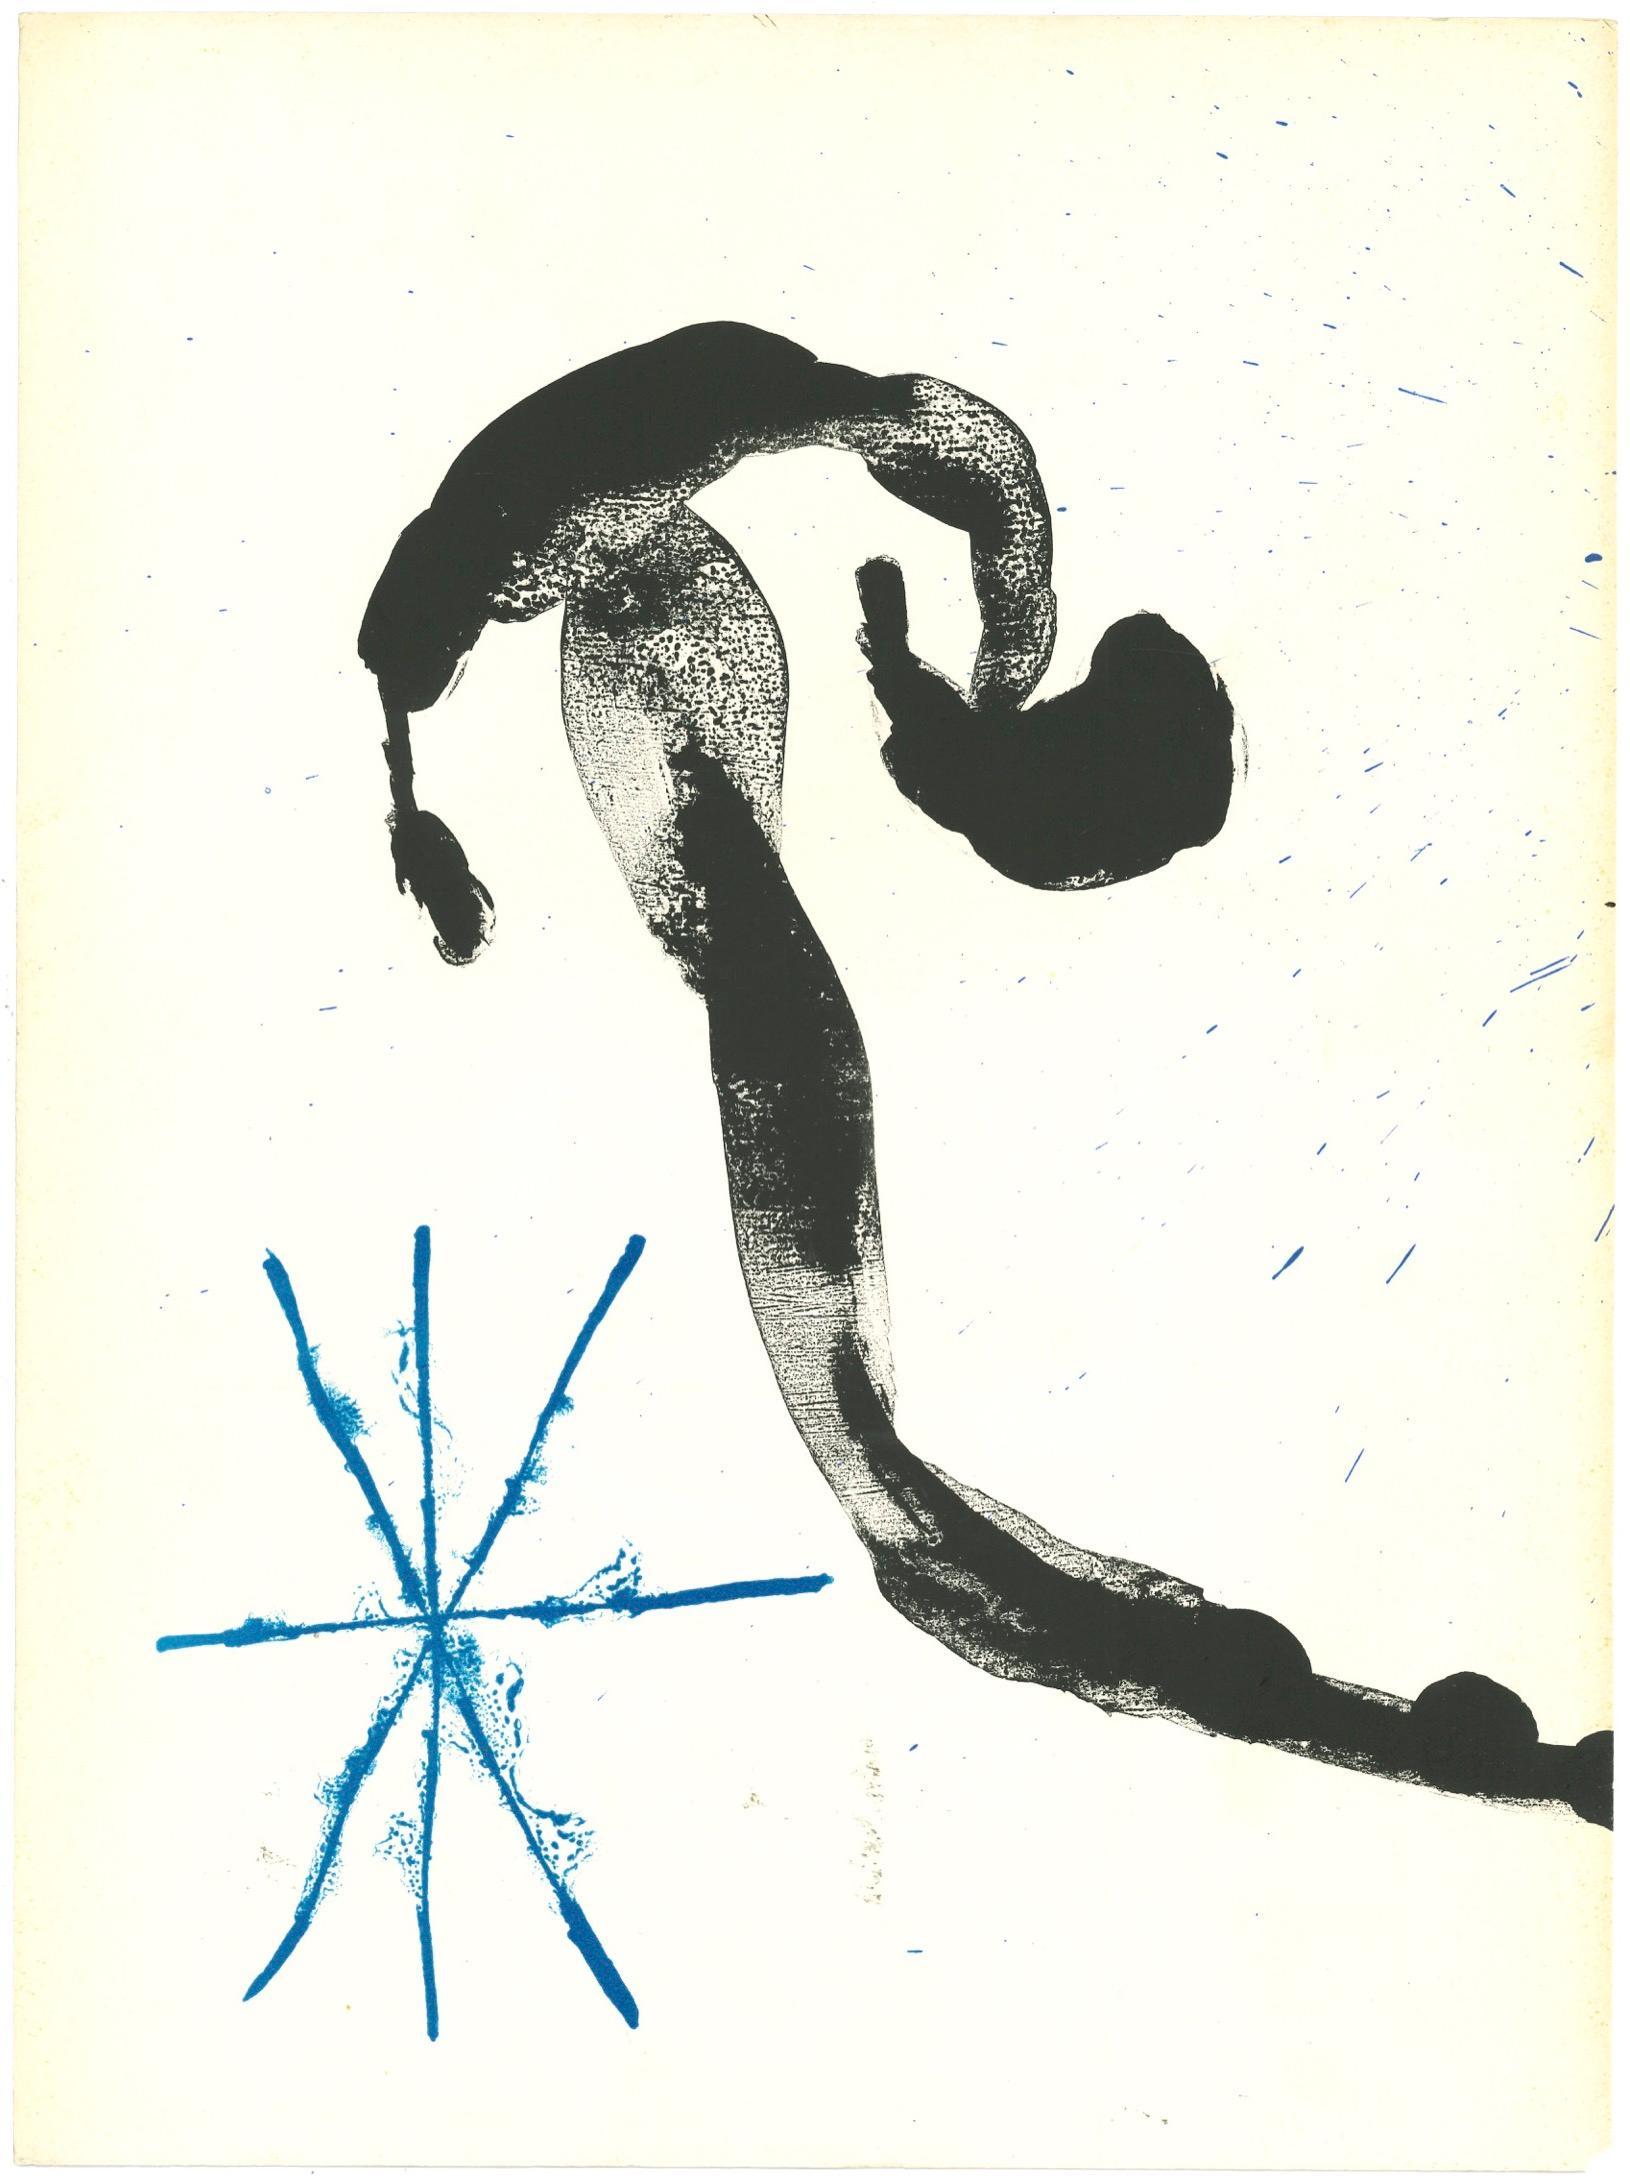 Blue Star - Original Lithograph by Joan Mirò - 1963